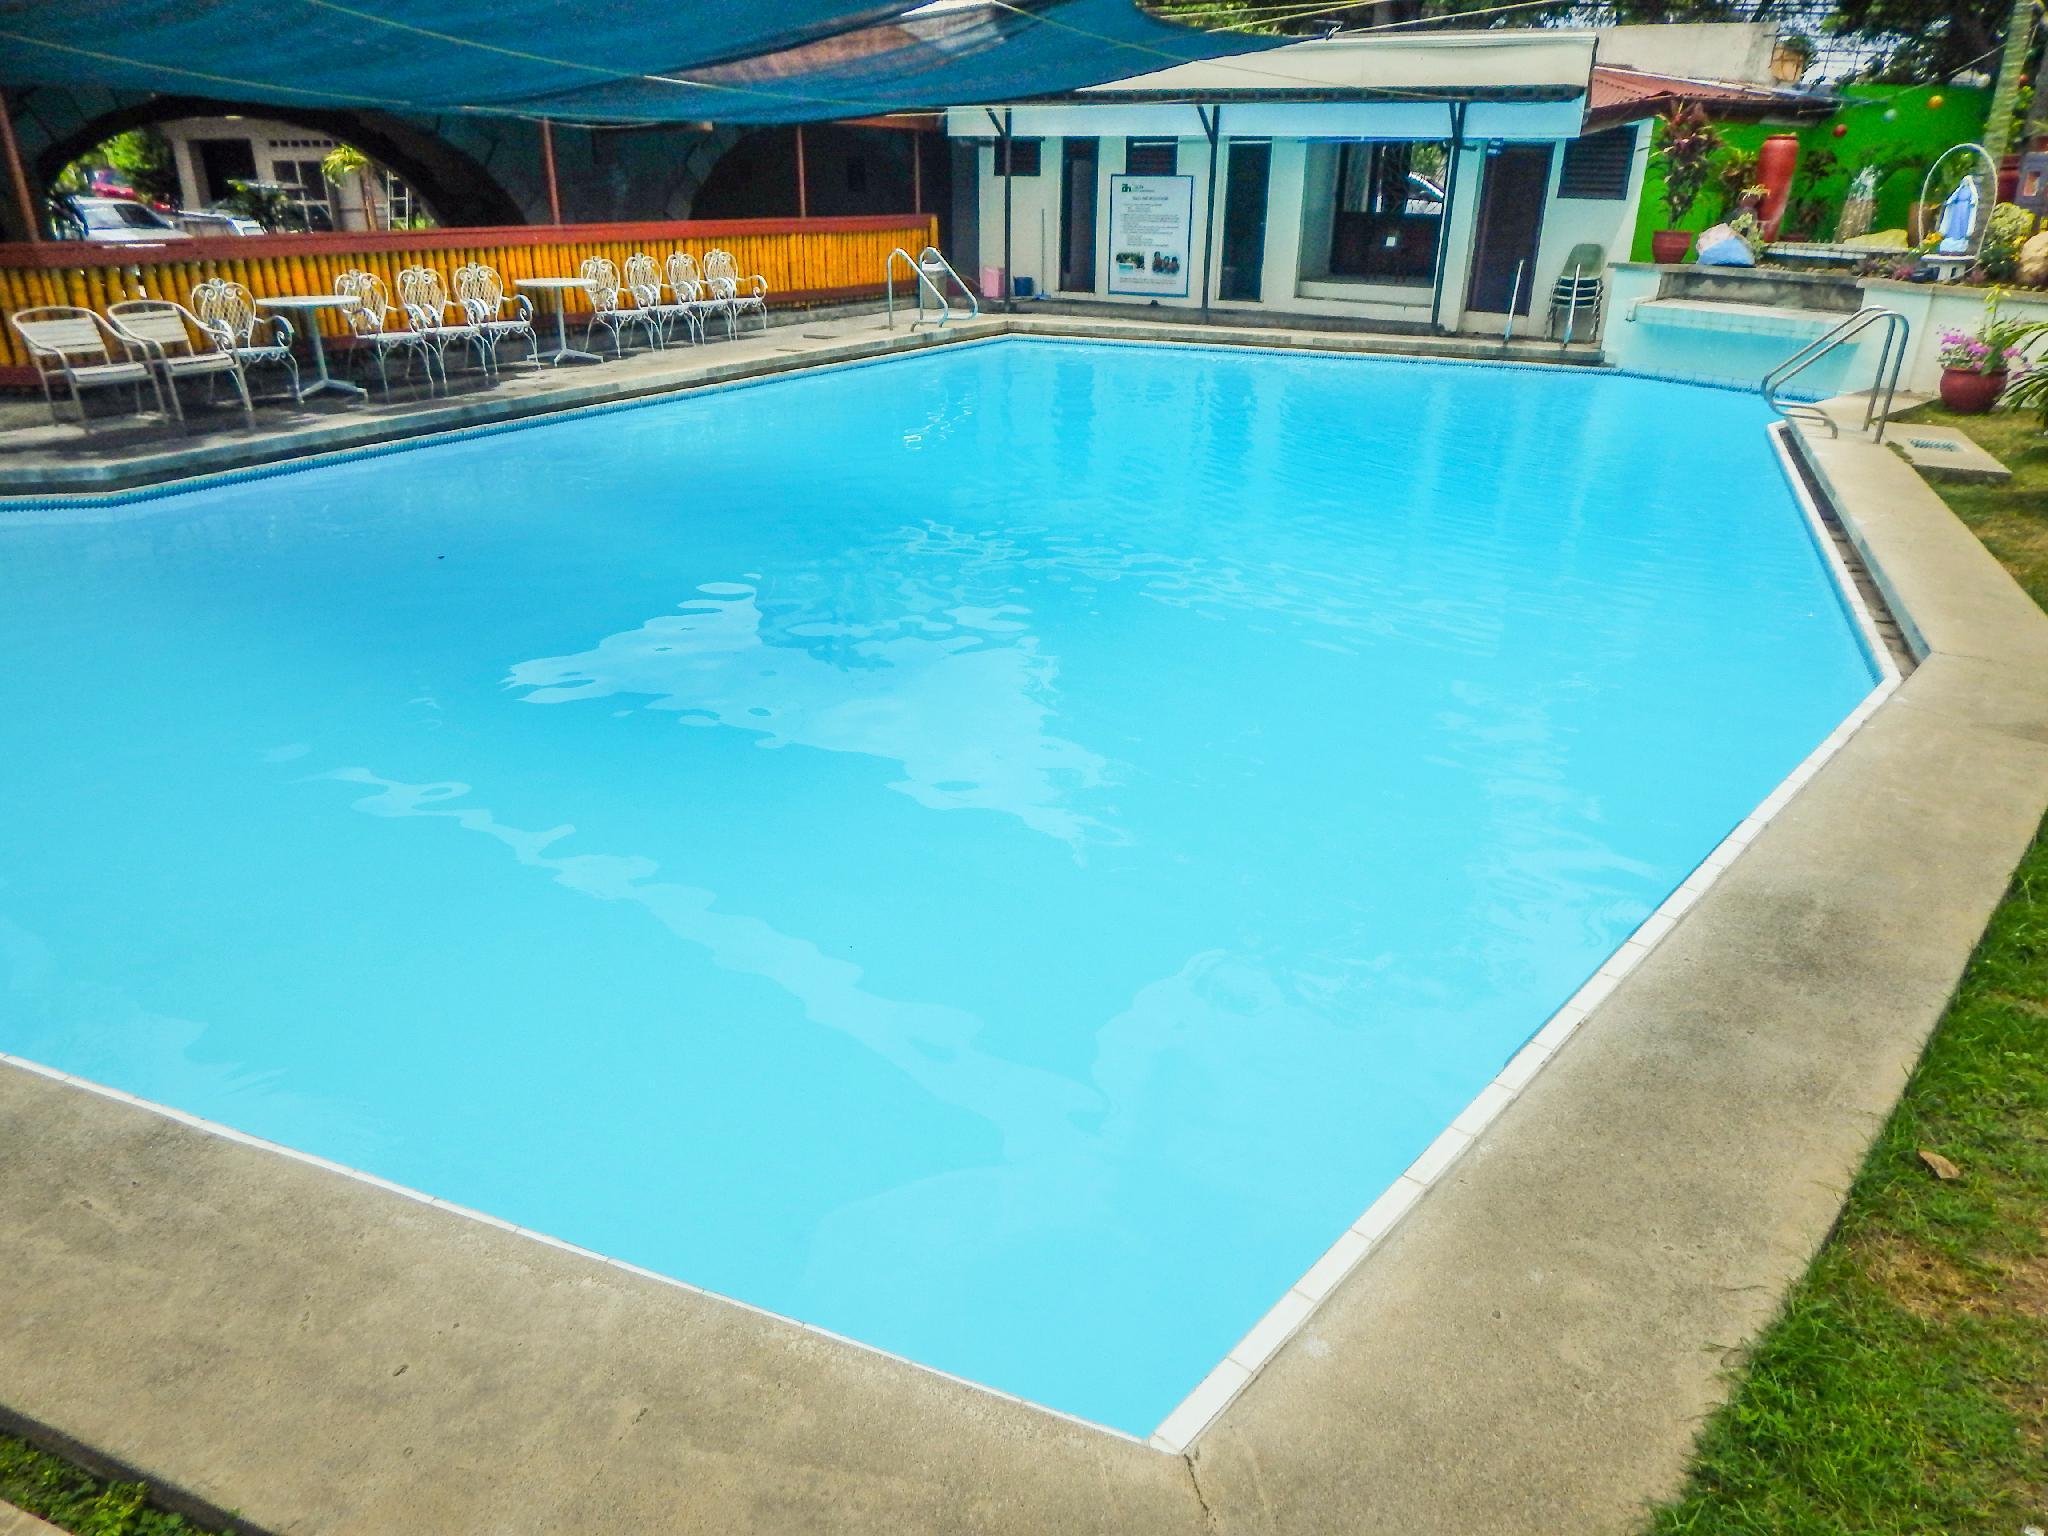 The Alpa Hotel and Restaurant, Batangas City